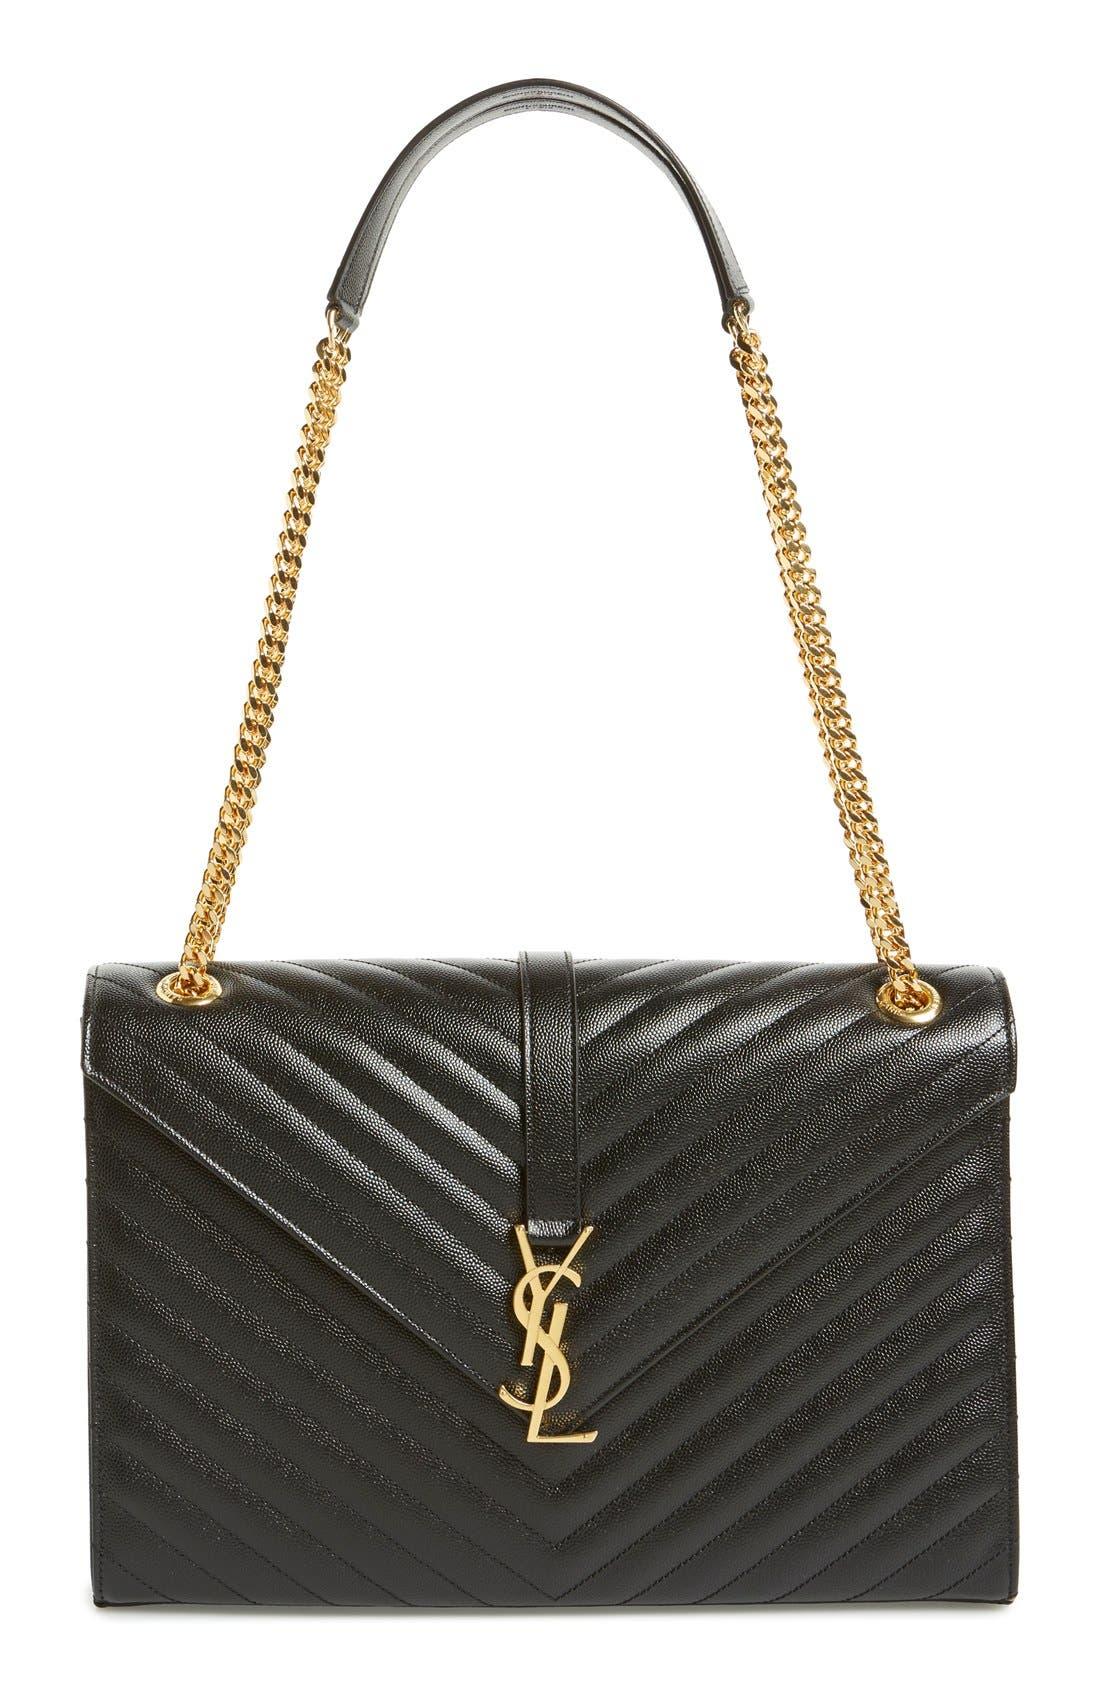 SAINT LAURENT Large Monogram Grained Leather Shoulder Bag